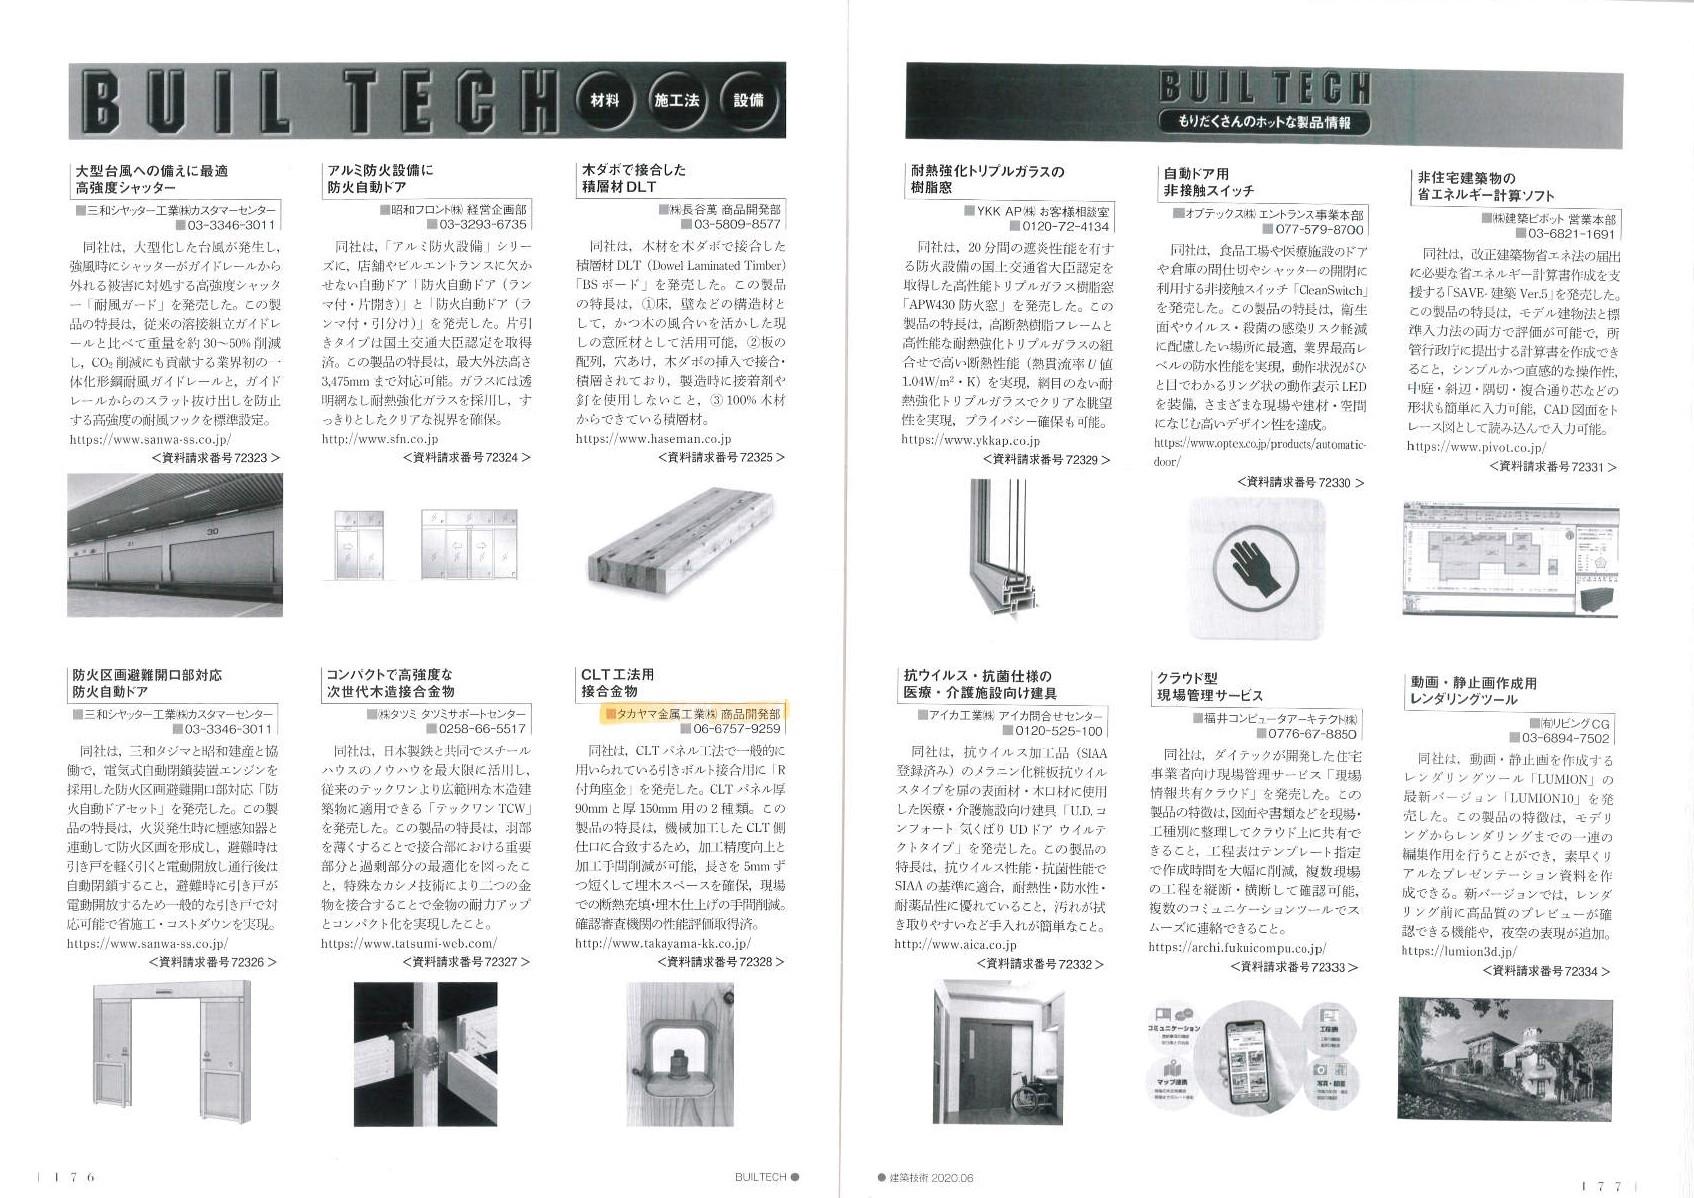 R付角座金掲載_建築技術6月号20200516.pdf